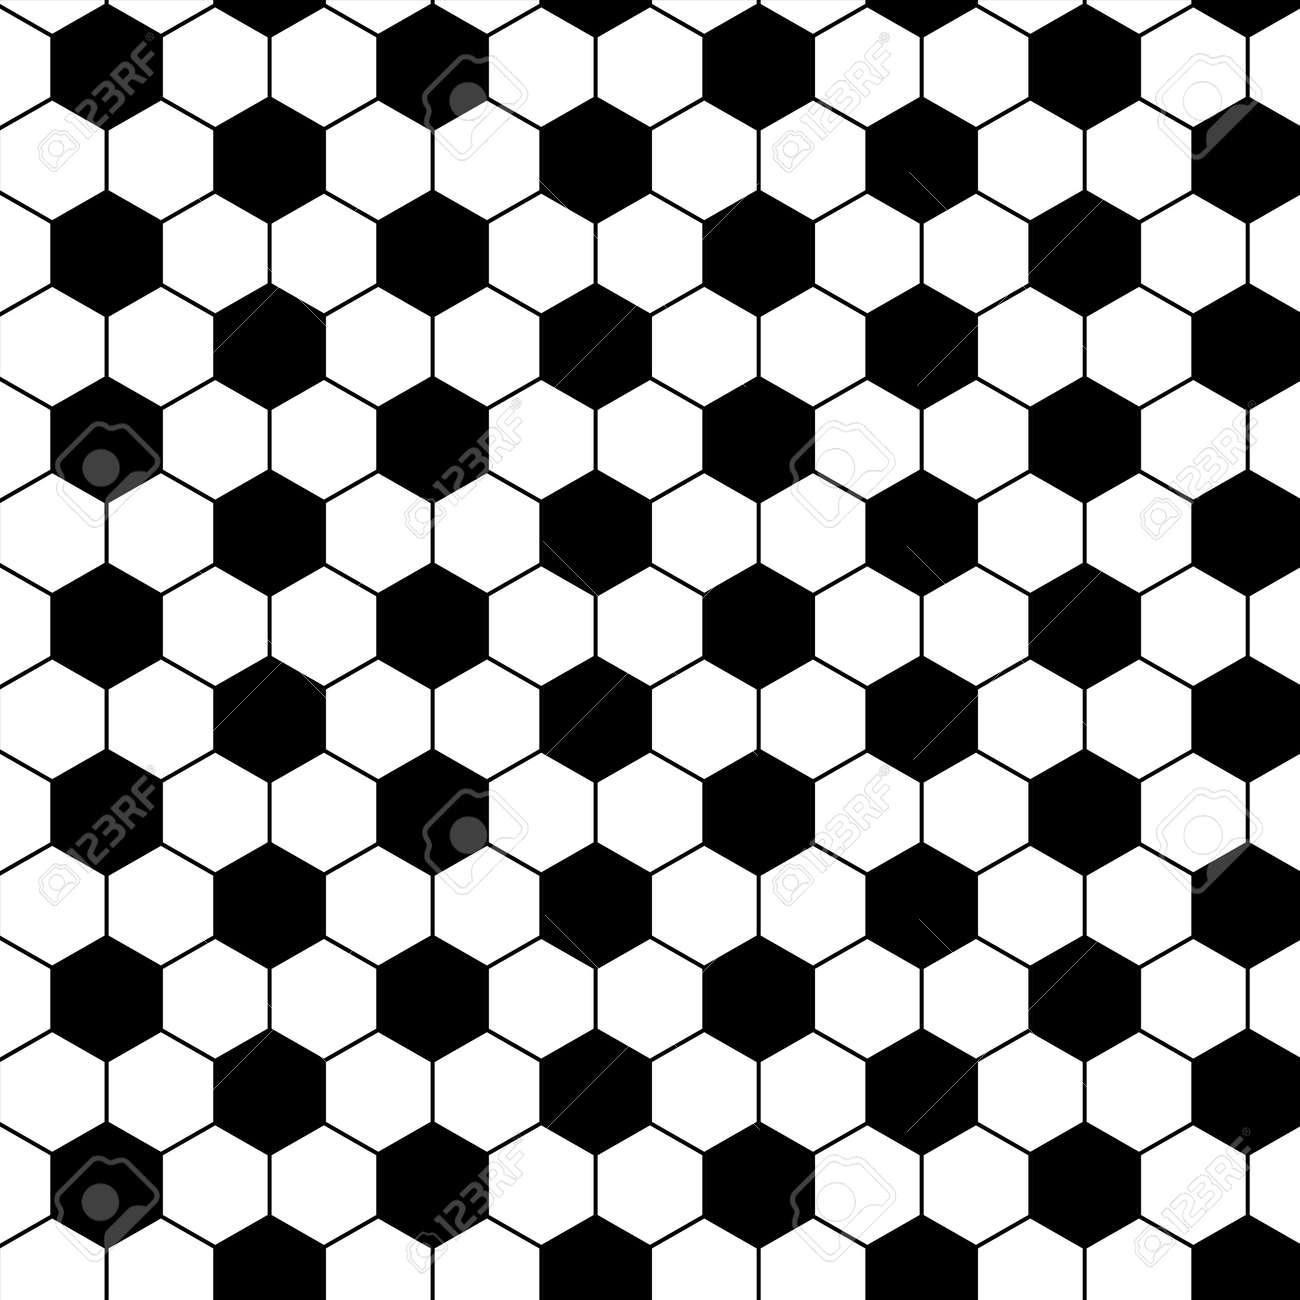 football seamless pattern Stock Vector - 29680619